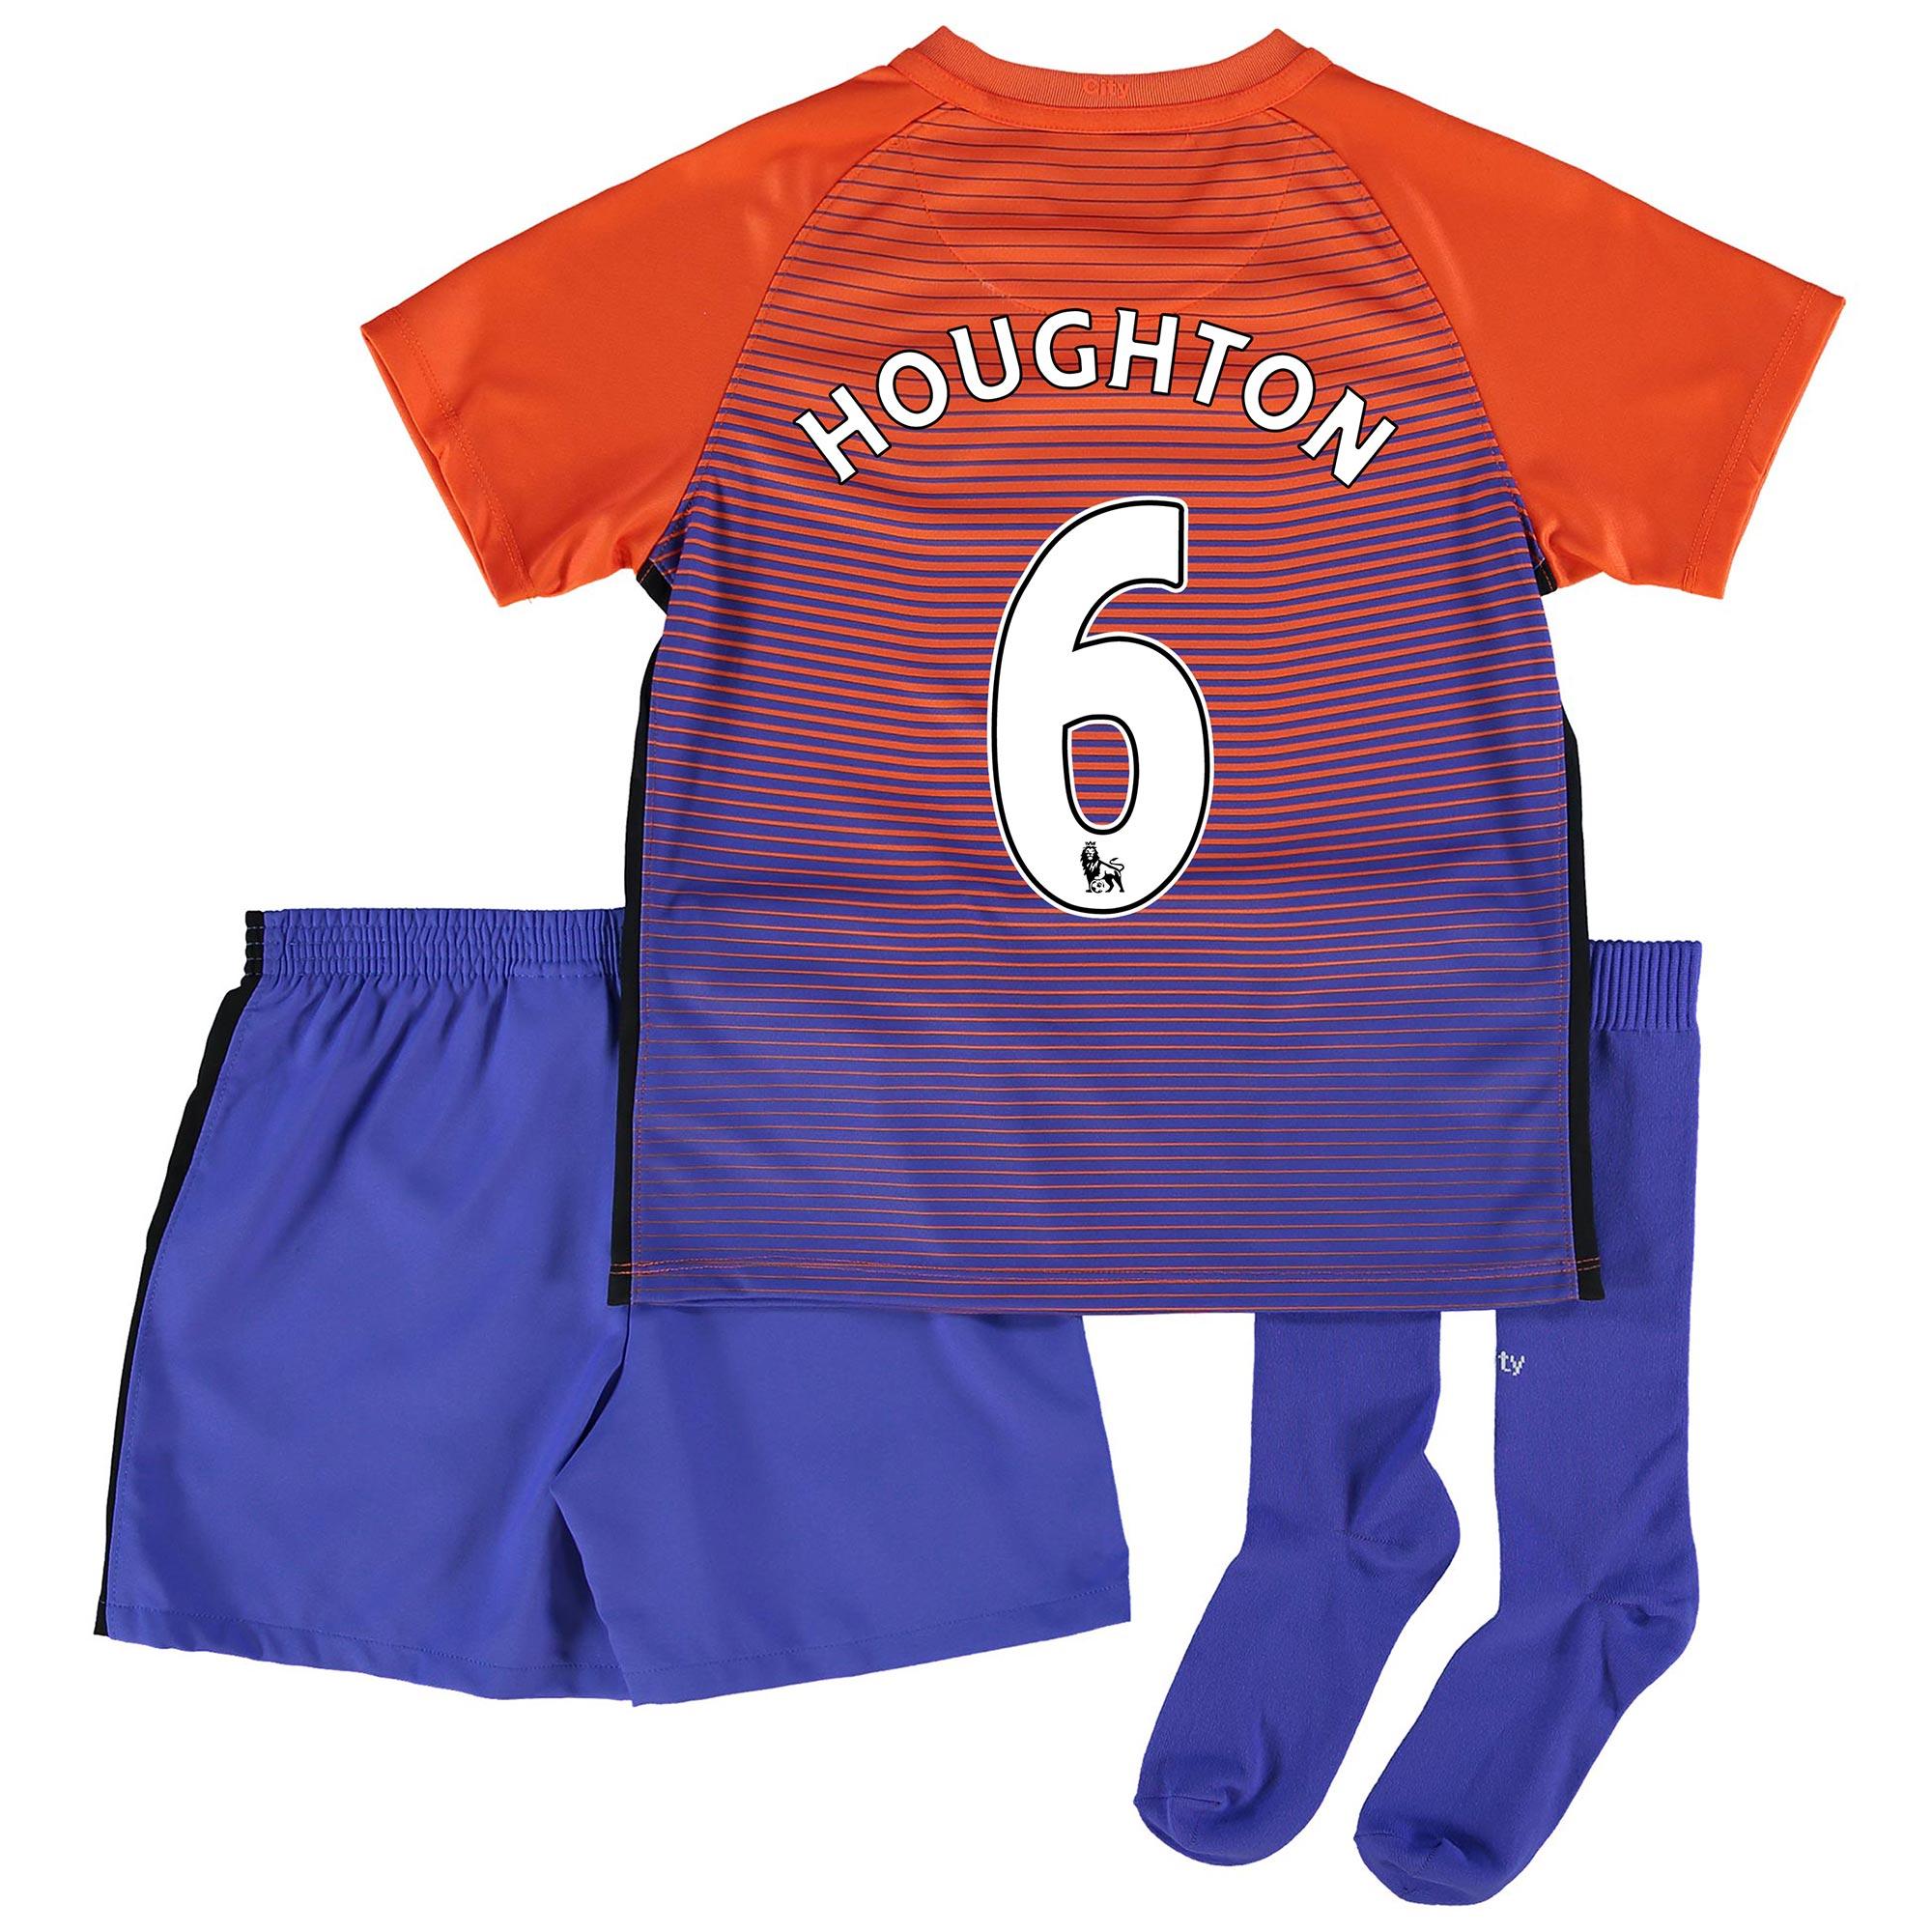 Manchester City Third Stadium Kit 2016-17 - Little Kids with Houghton